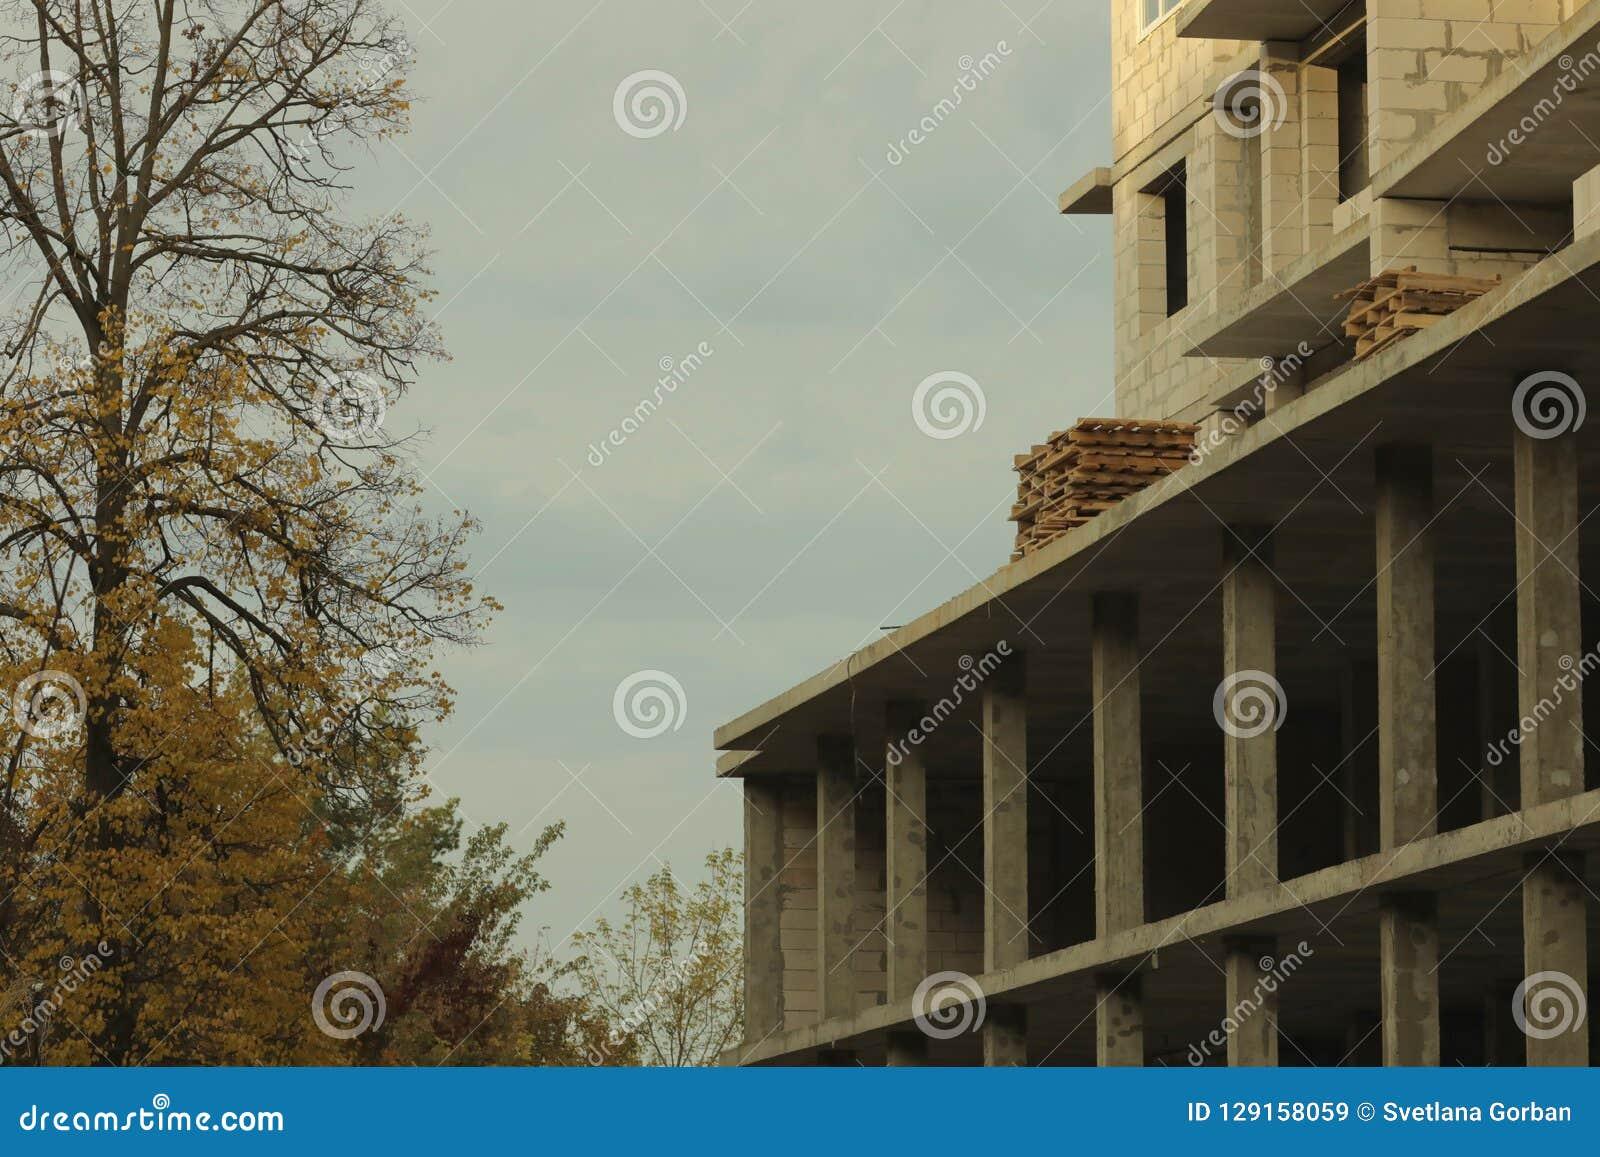 De onvolledige high-rise bouw, kraan, architectuur